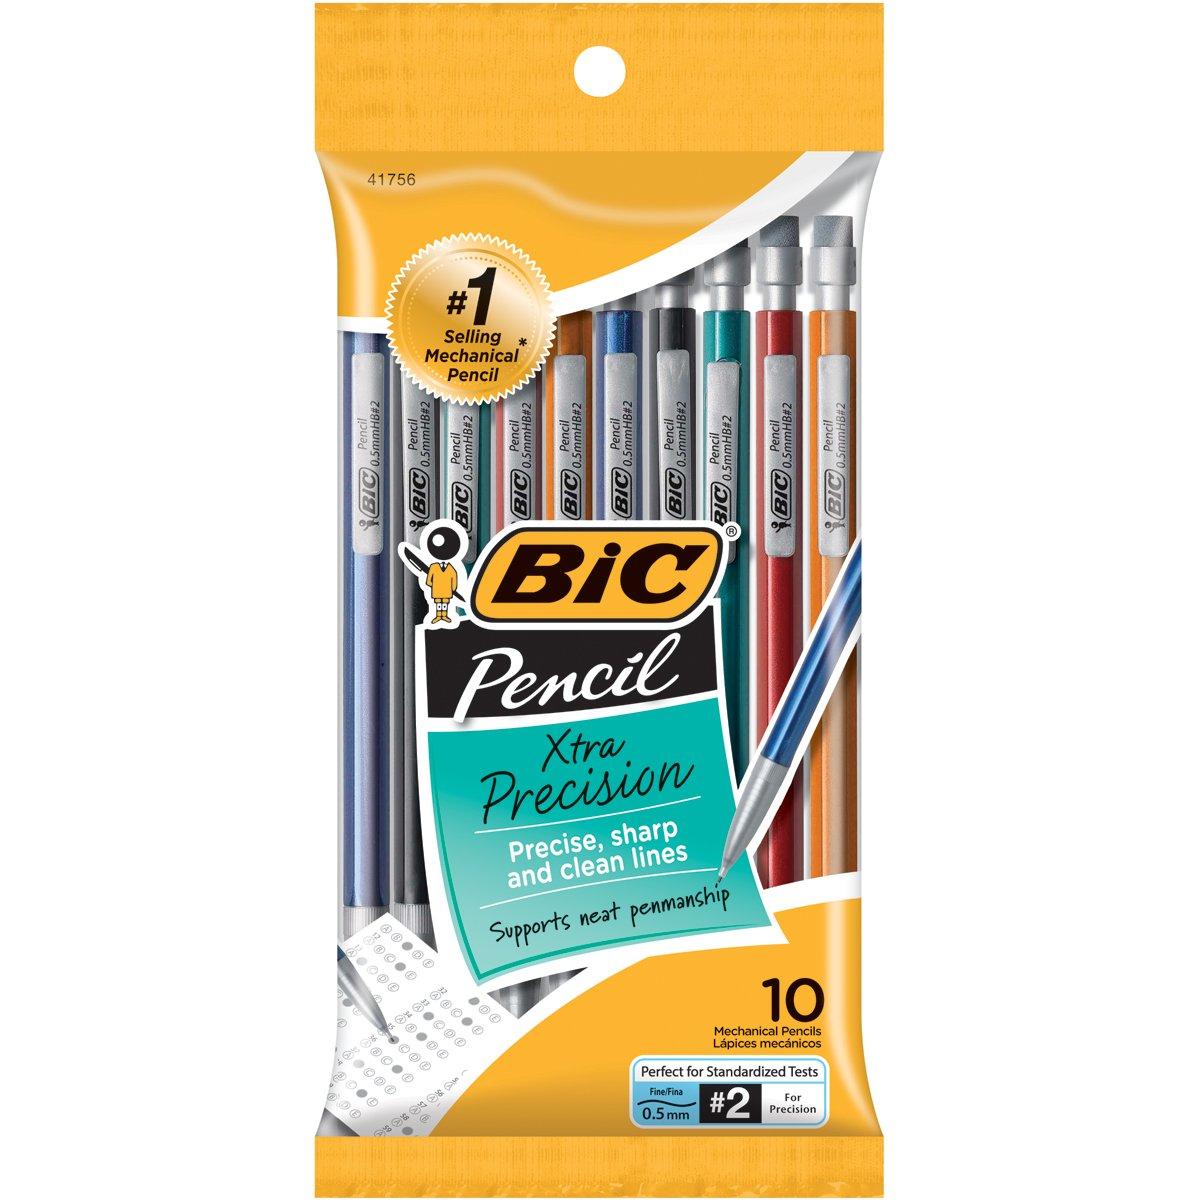 10 Lapices Bic Extra Precision - Lapices Mecanicos